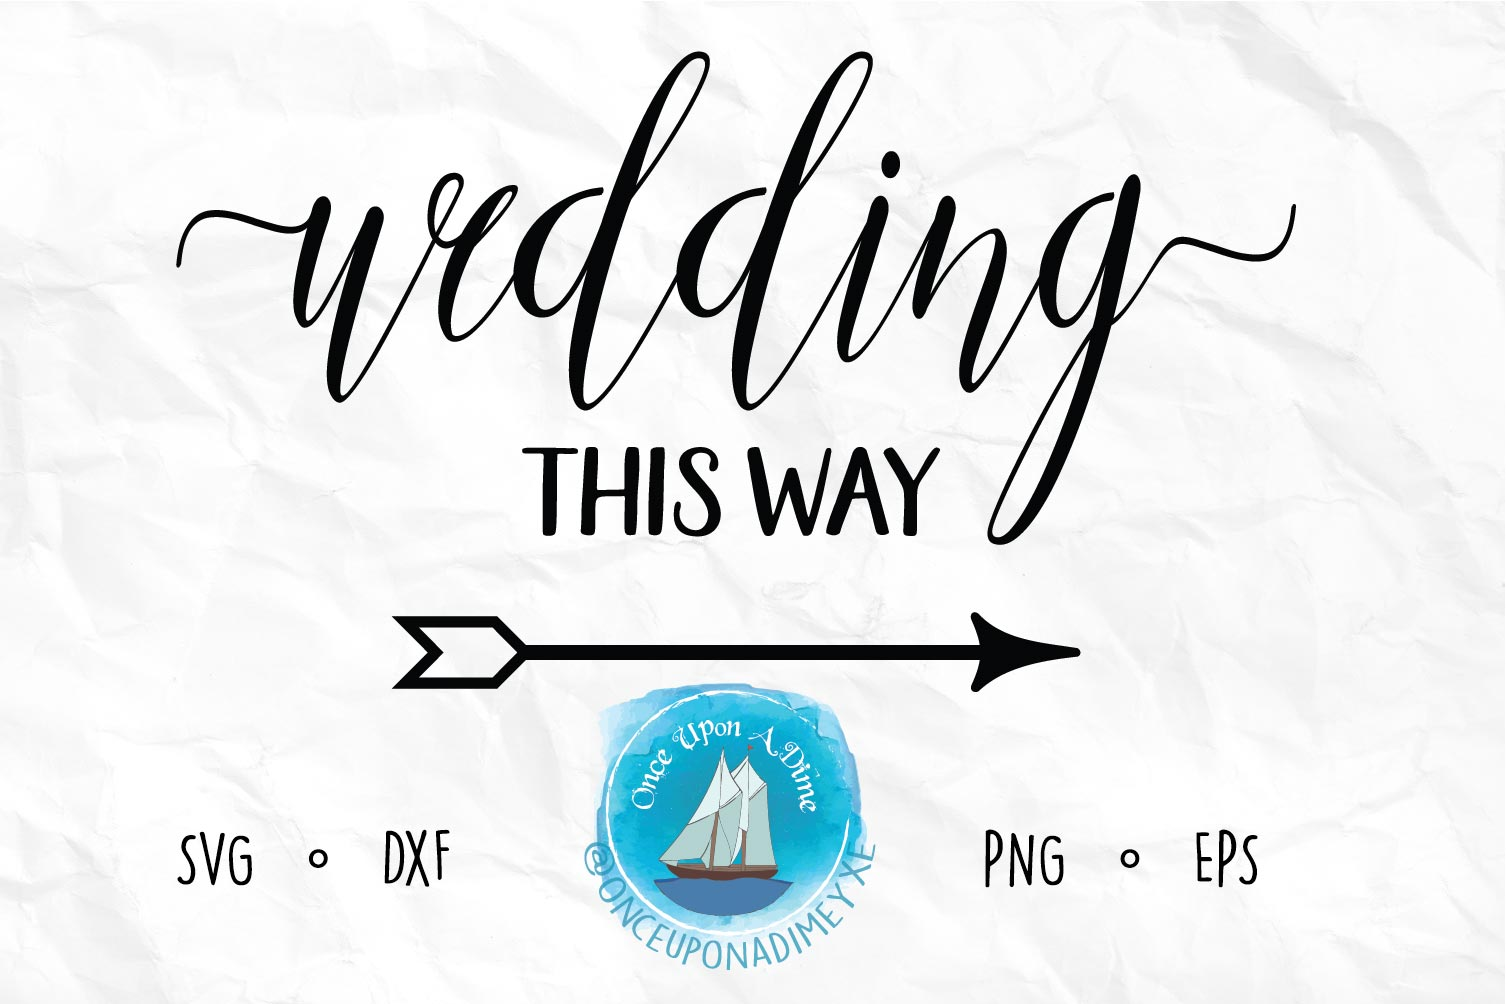 Wedding This Way example image 1